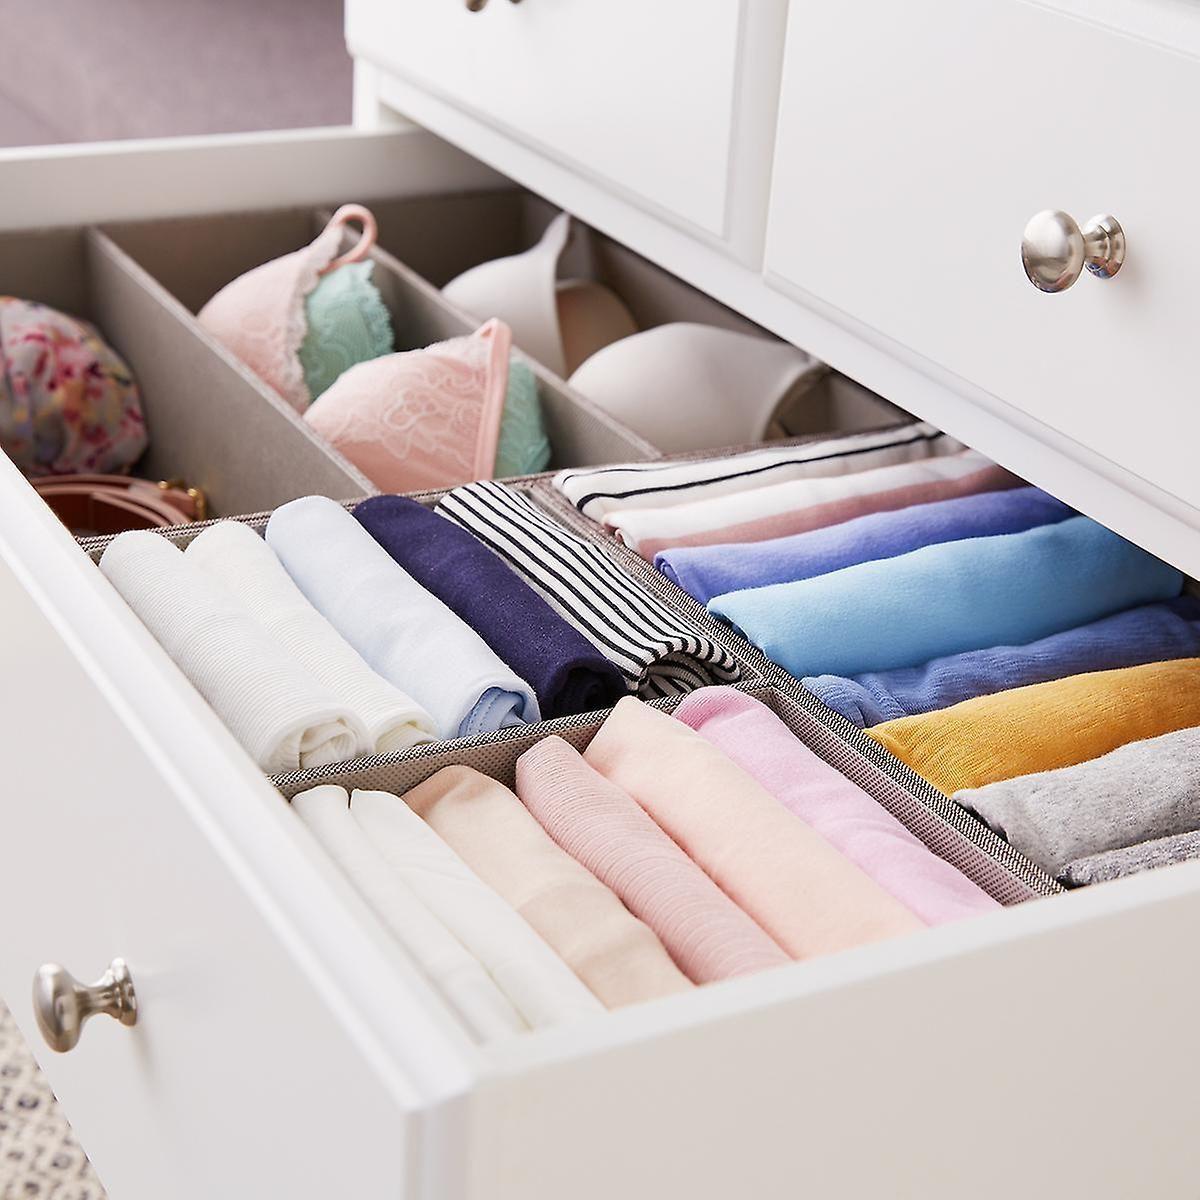 5 x 5 Grey Drawer Organization Starter Kit  Dresser drawer